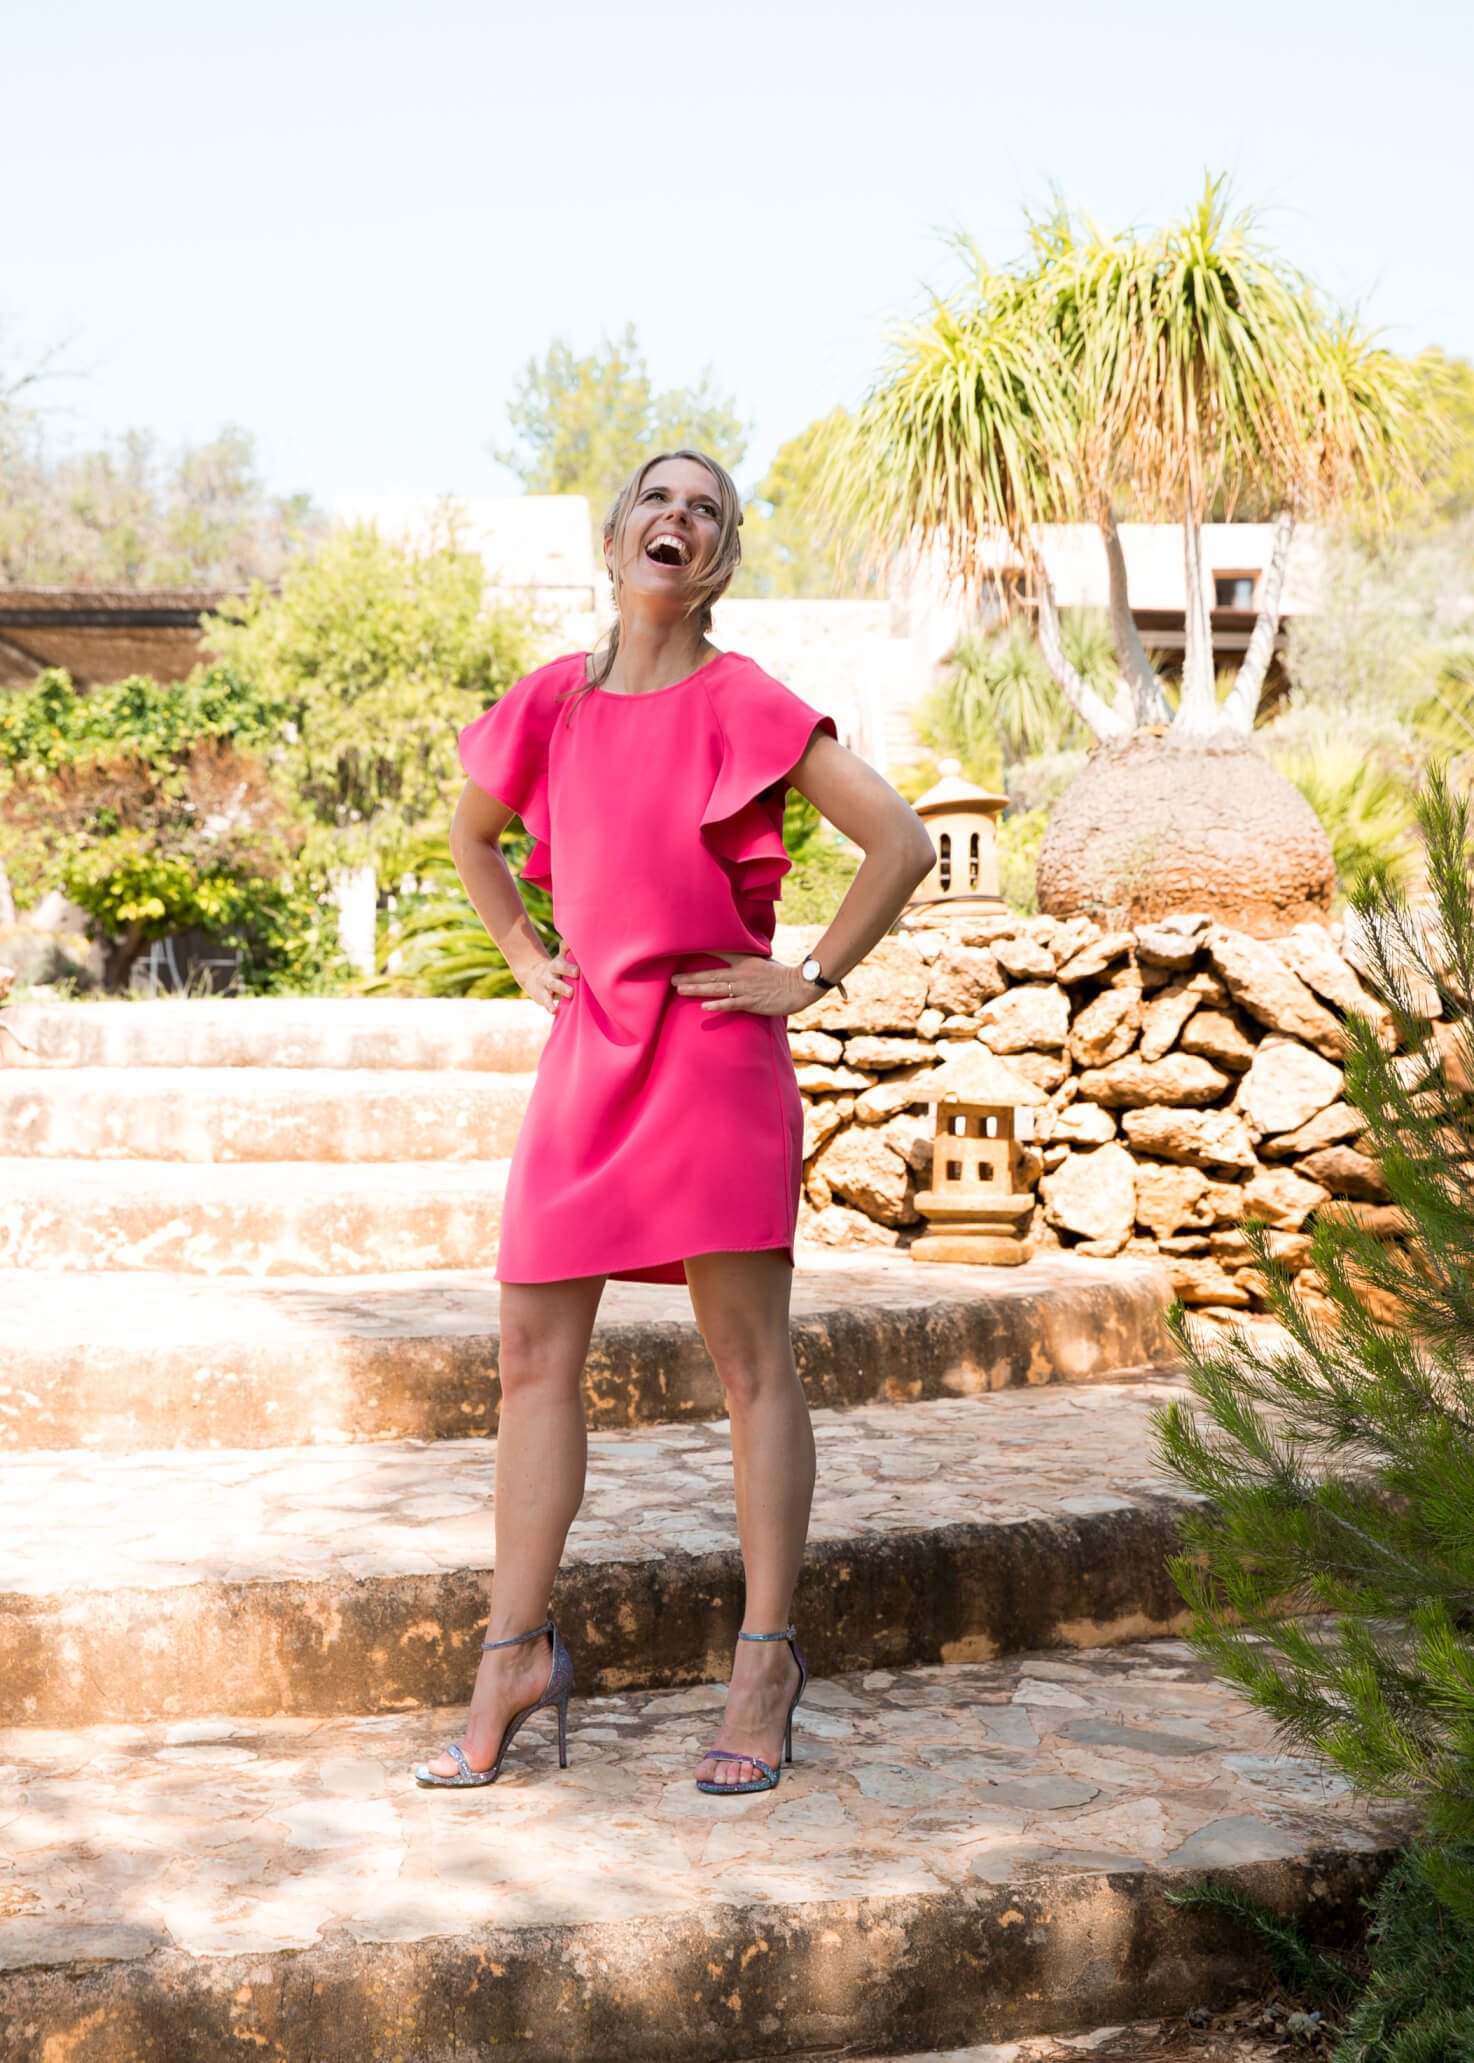 Relinde Moors in Hot Pink Dress. Integrative Business & Energy Strategist Relinde Moors